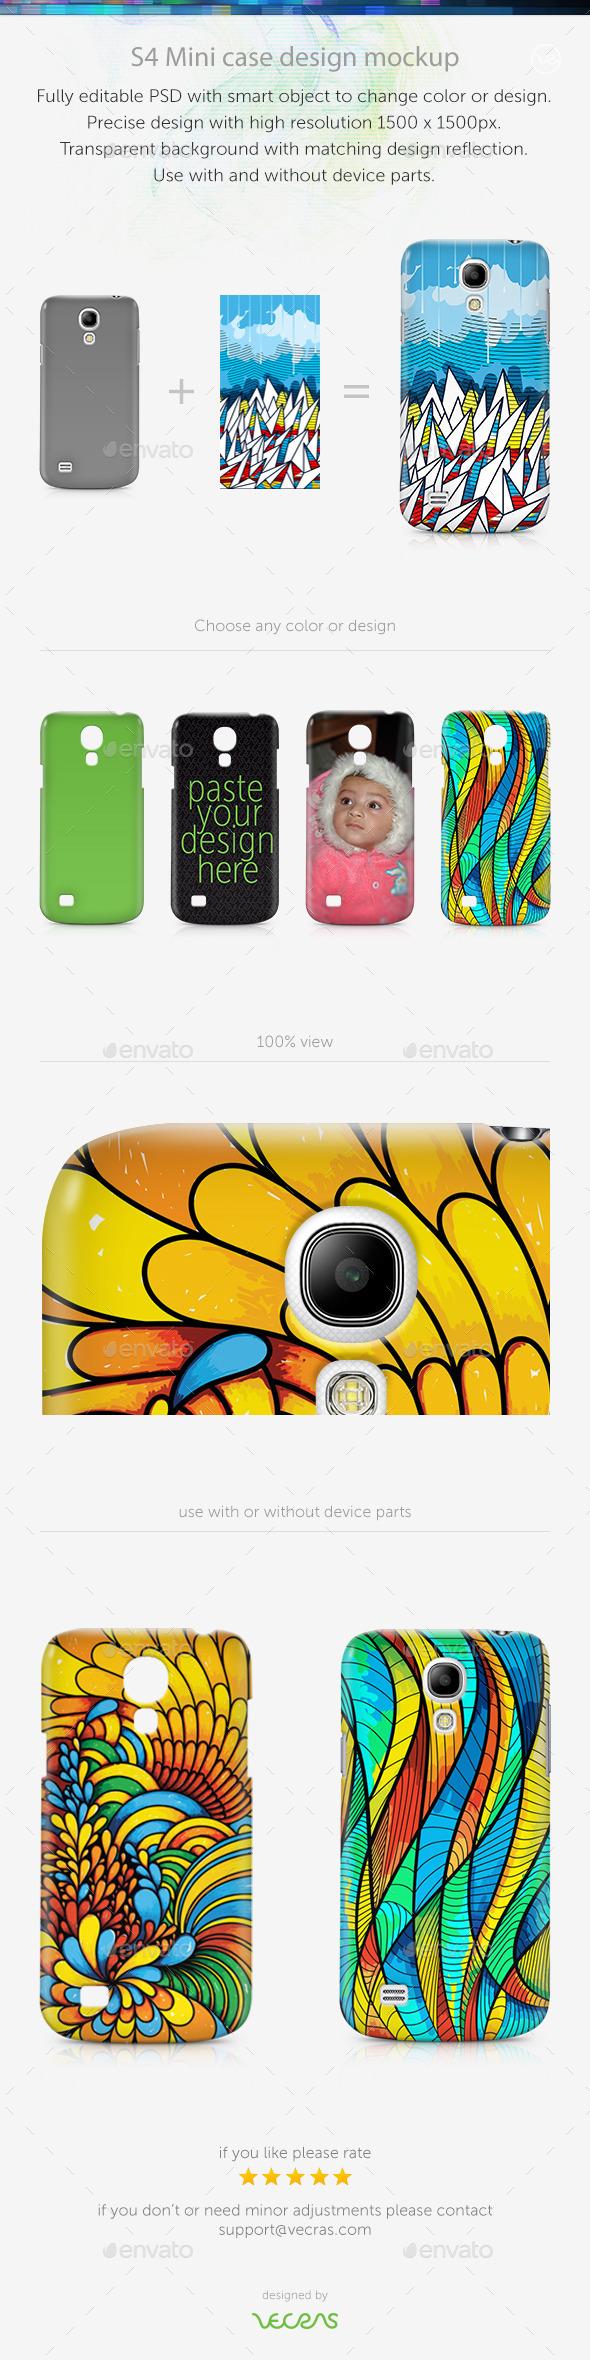 S4 Mini Case Design Mockup - Mobile Displays